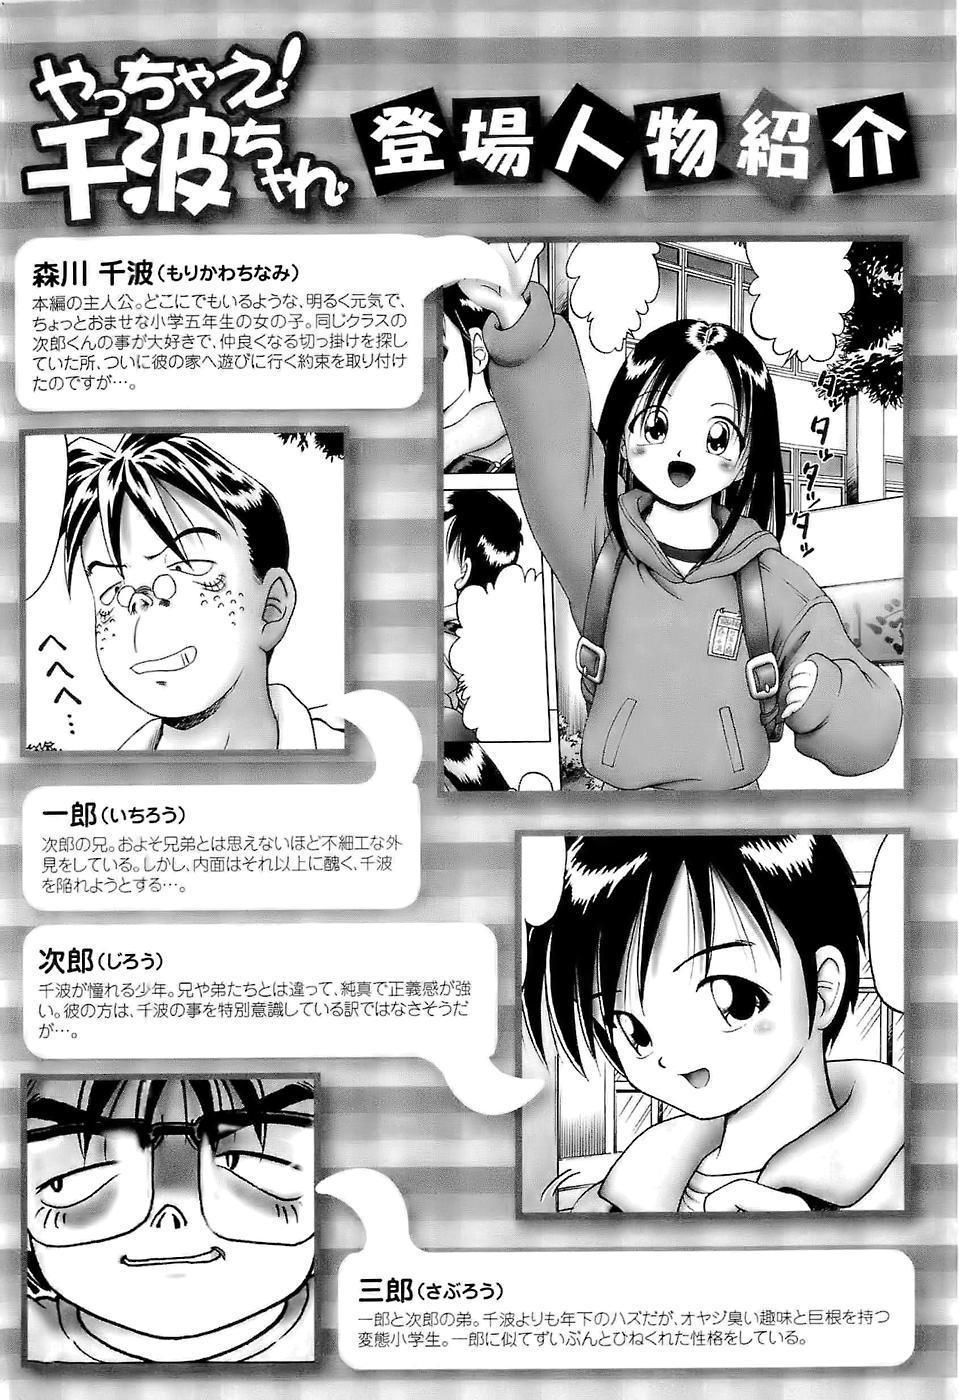 [Bow Rei] Osanai Kajitsu -Inkou Shougakusei no Houkago- Jou 5